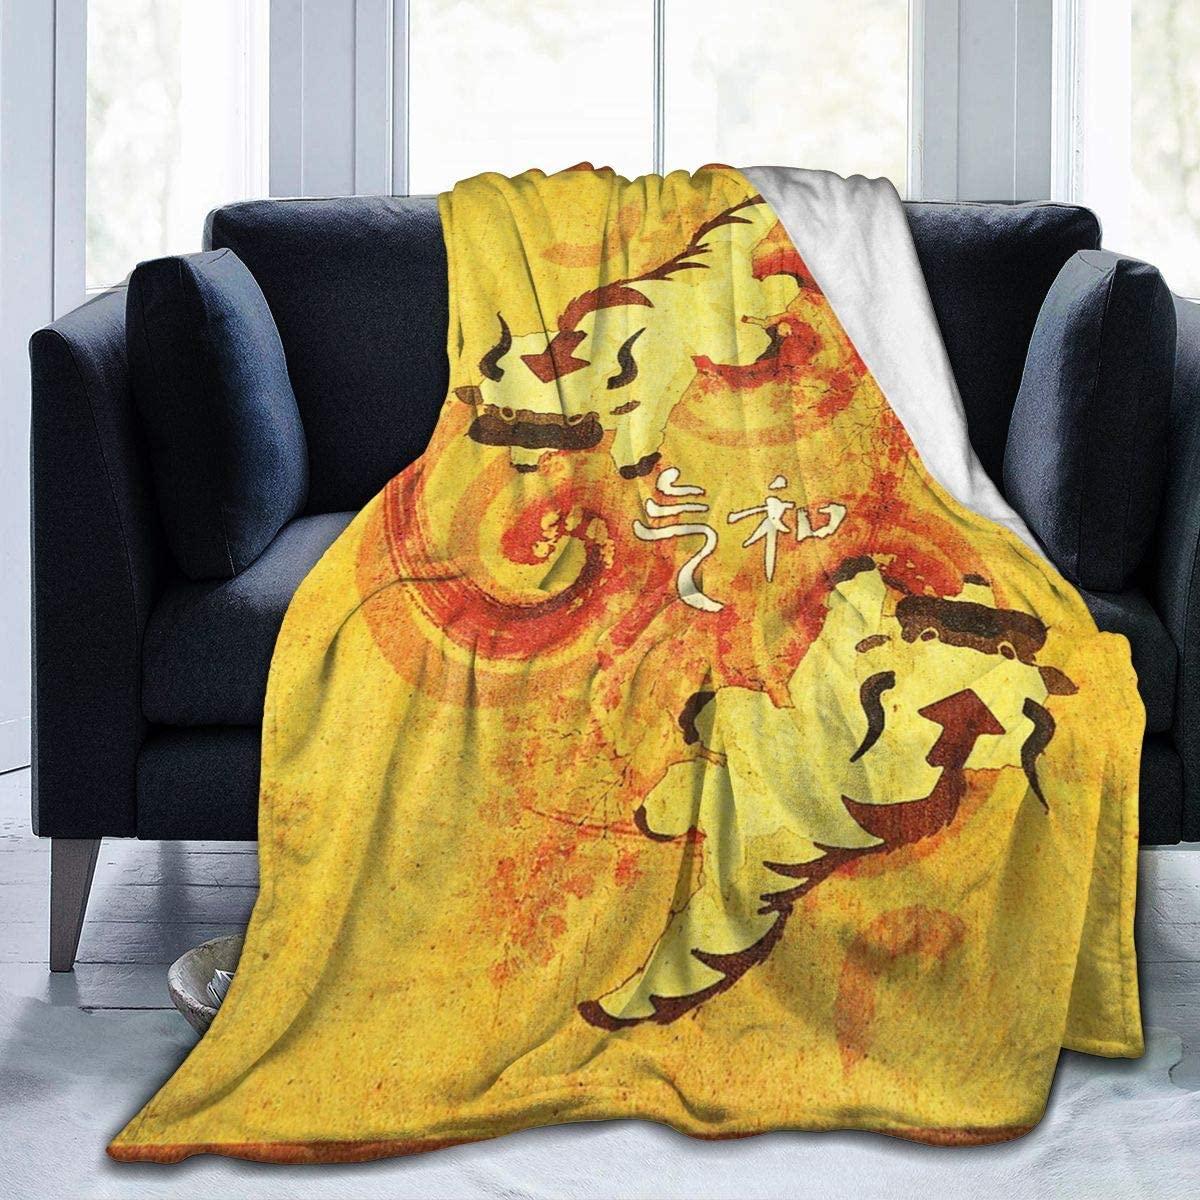 Upd First Flannel Blanket Multi-Styles Avatar The Last Legend Airbender Atla Comics Anime Manga Air Lightweight Flannel Fleece Velvet-Plush All-Season Throw for Bed/Couch 50